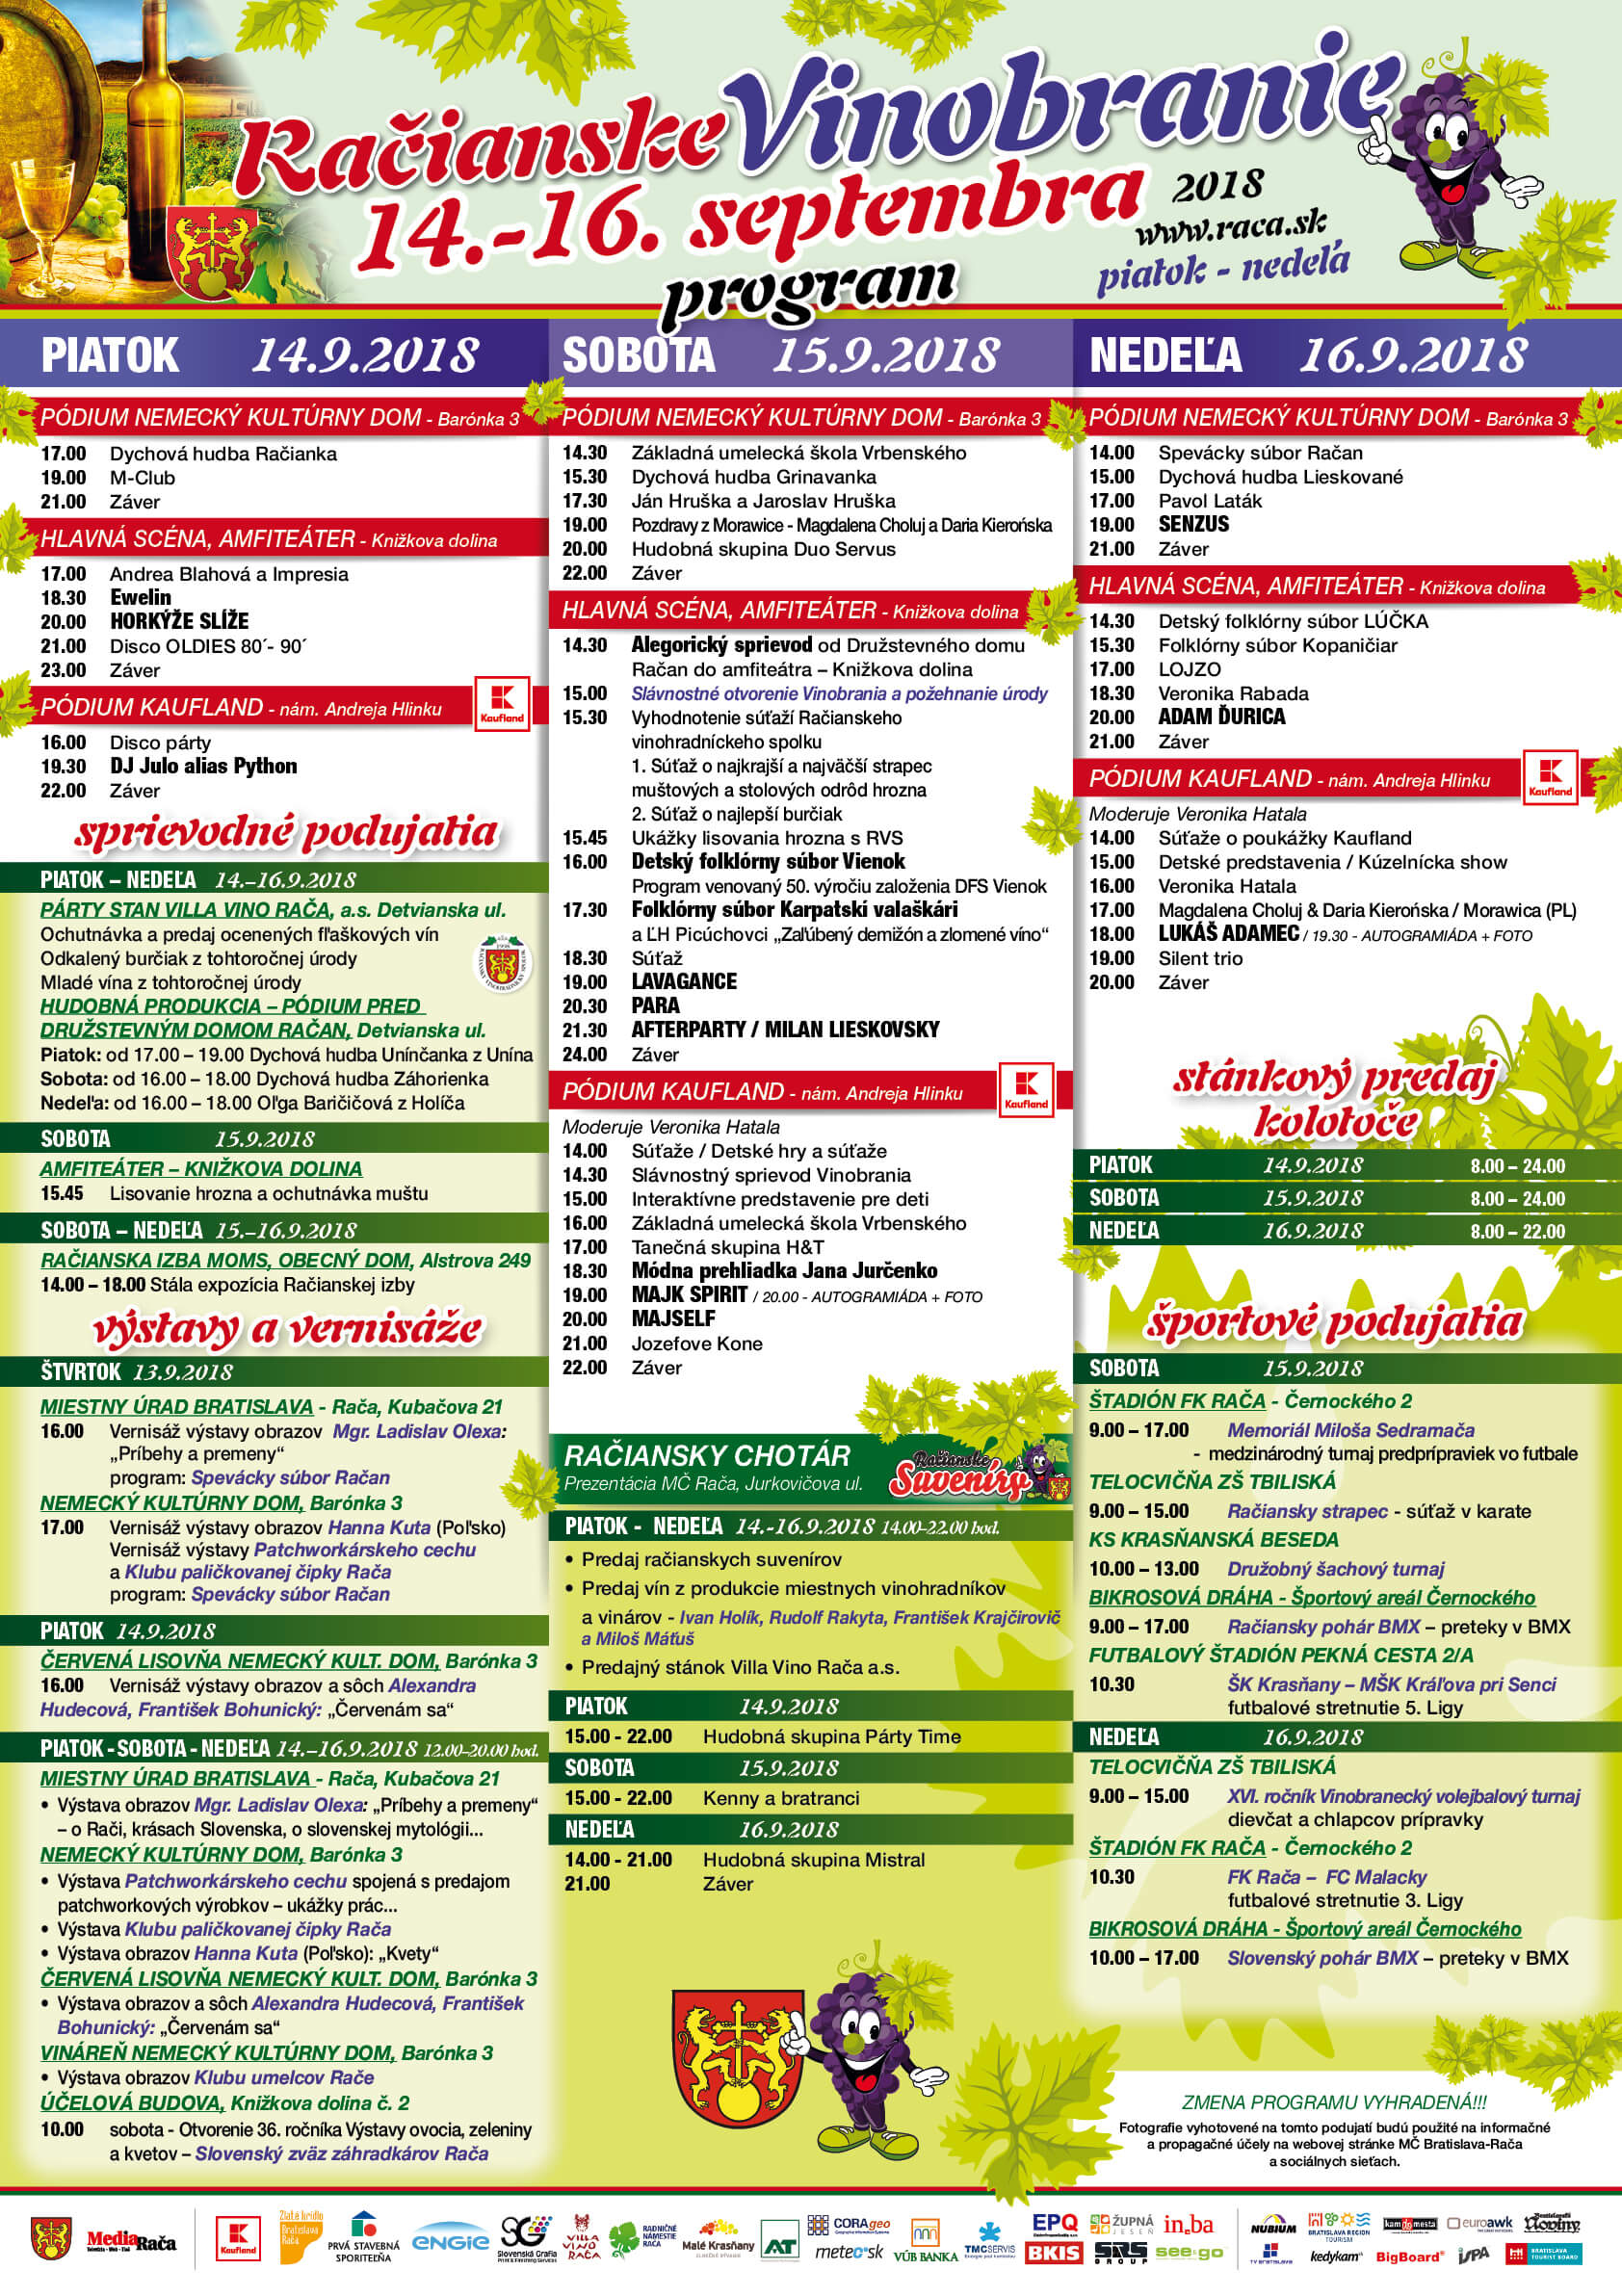 Račianske vinobranie 2018 Poster.jpg ... a235d224fdd